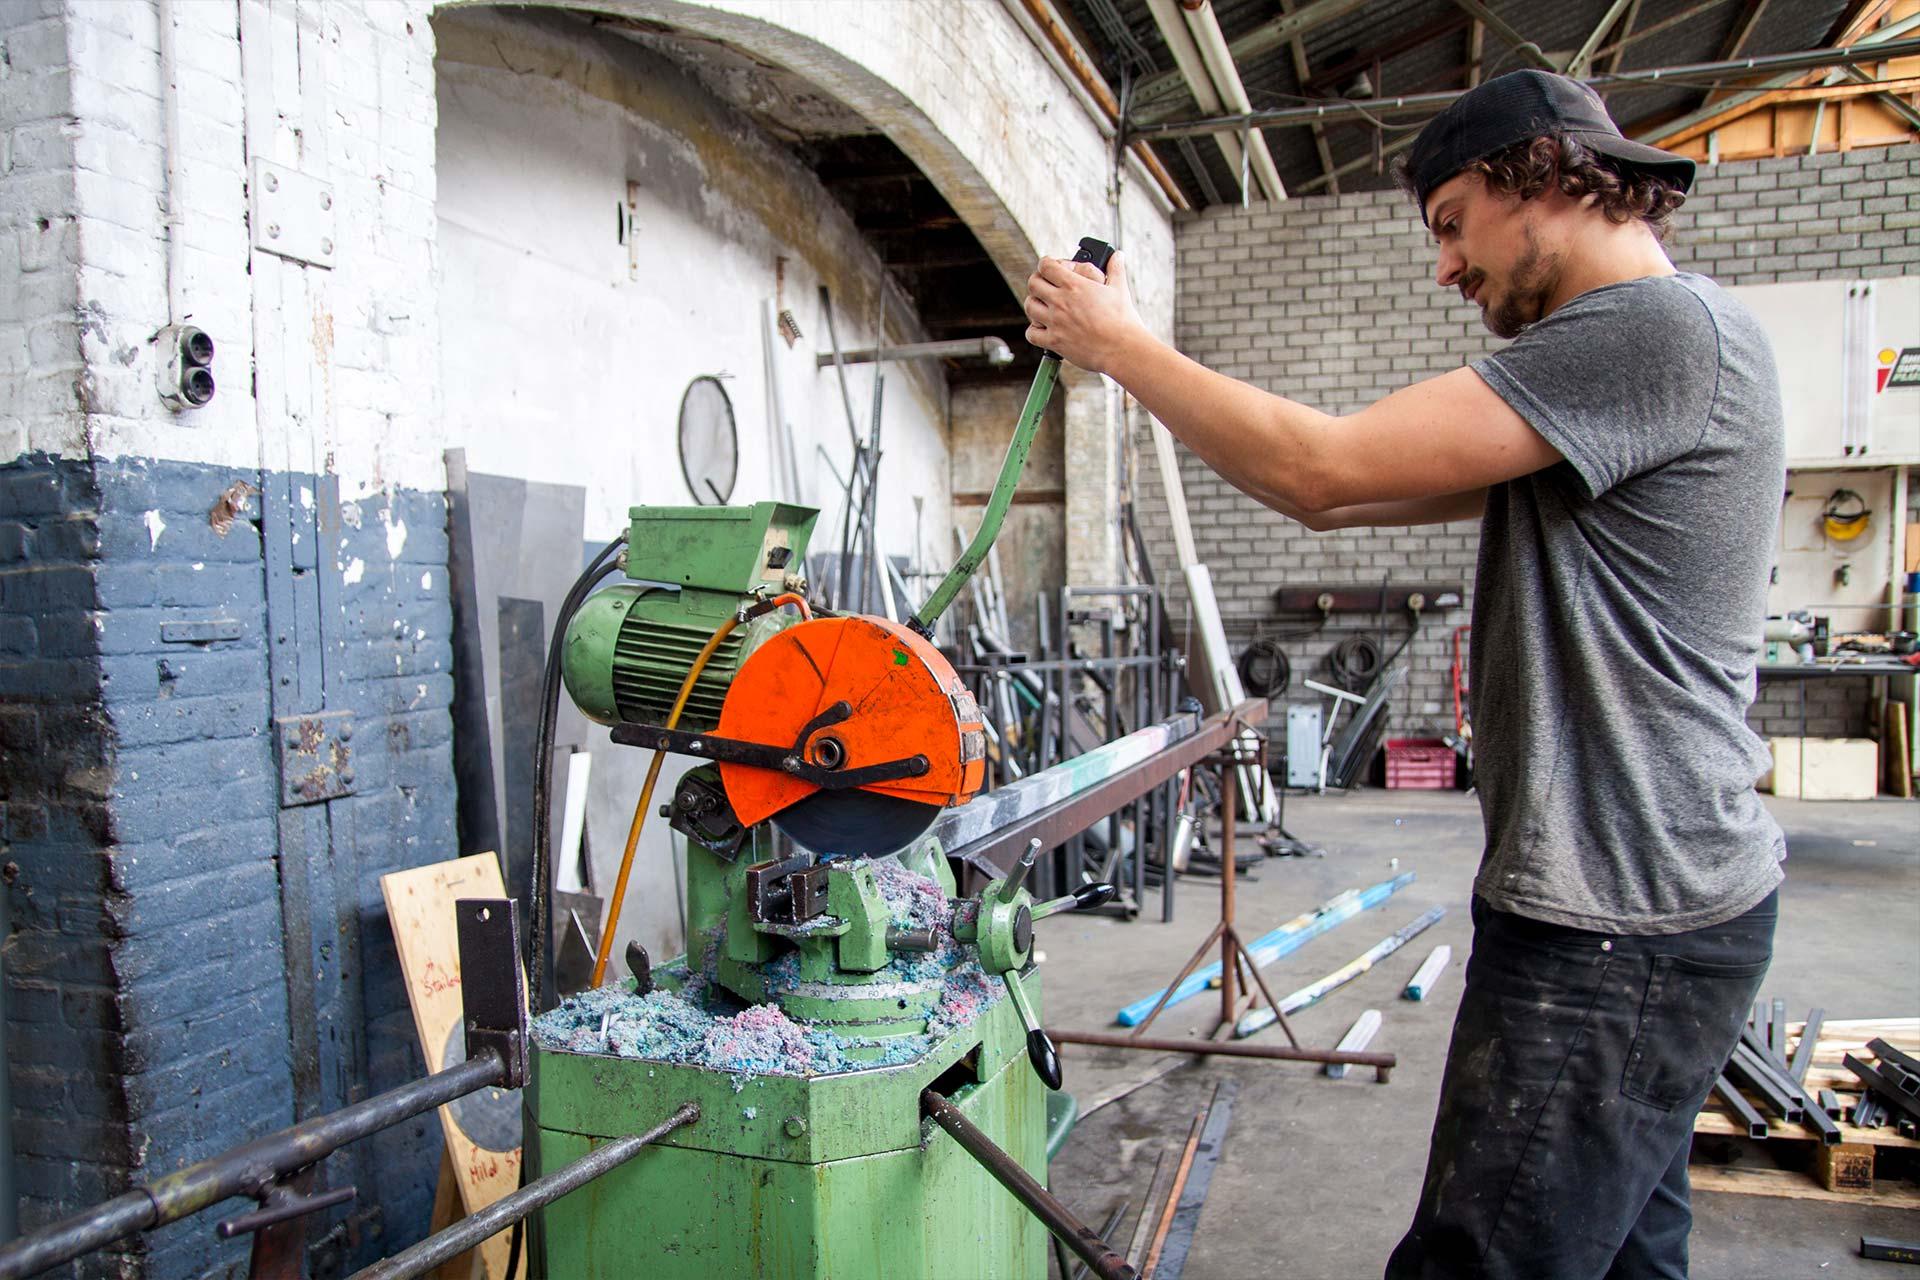 man cutting a plastic beam